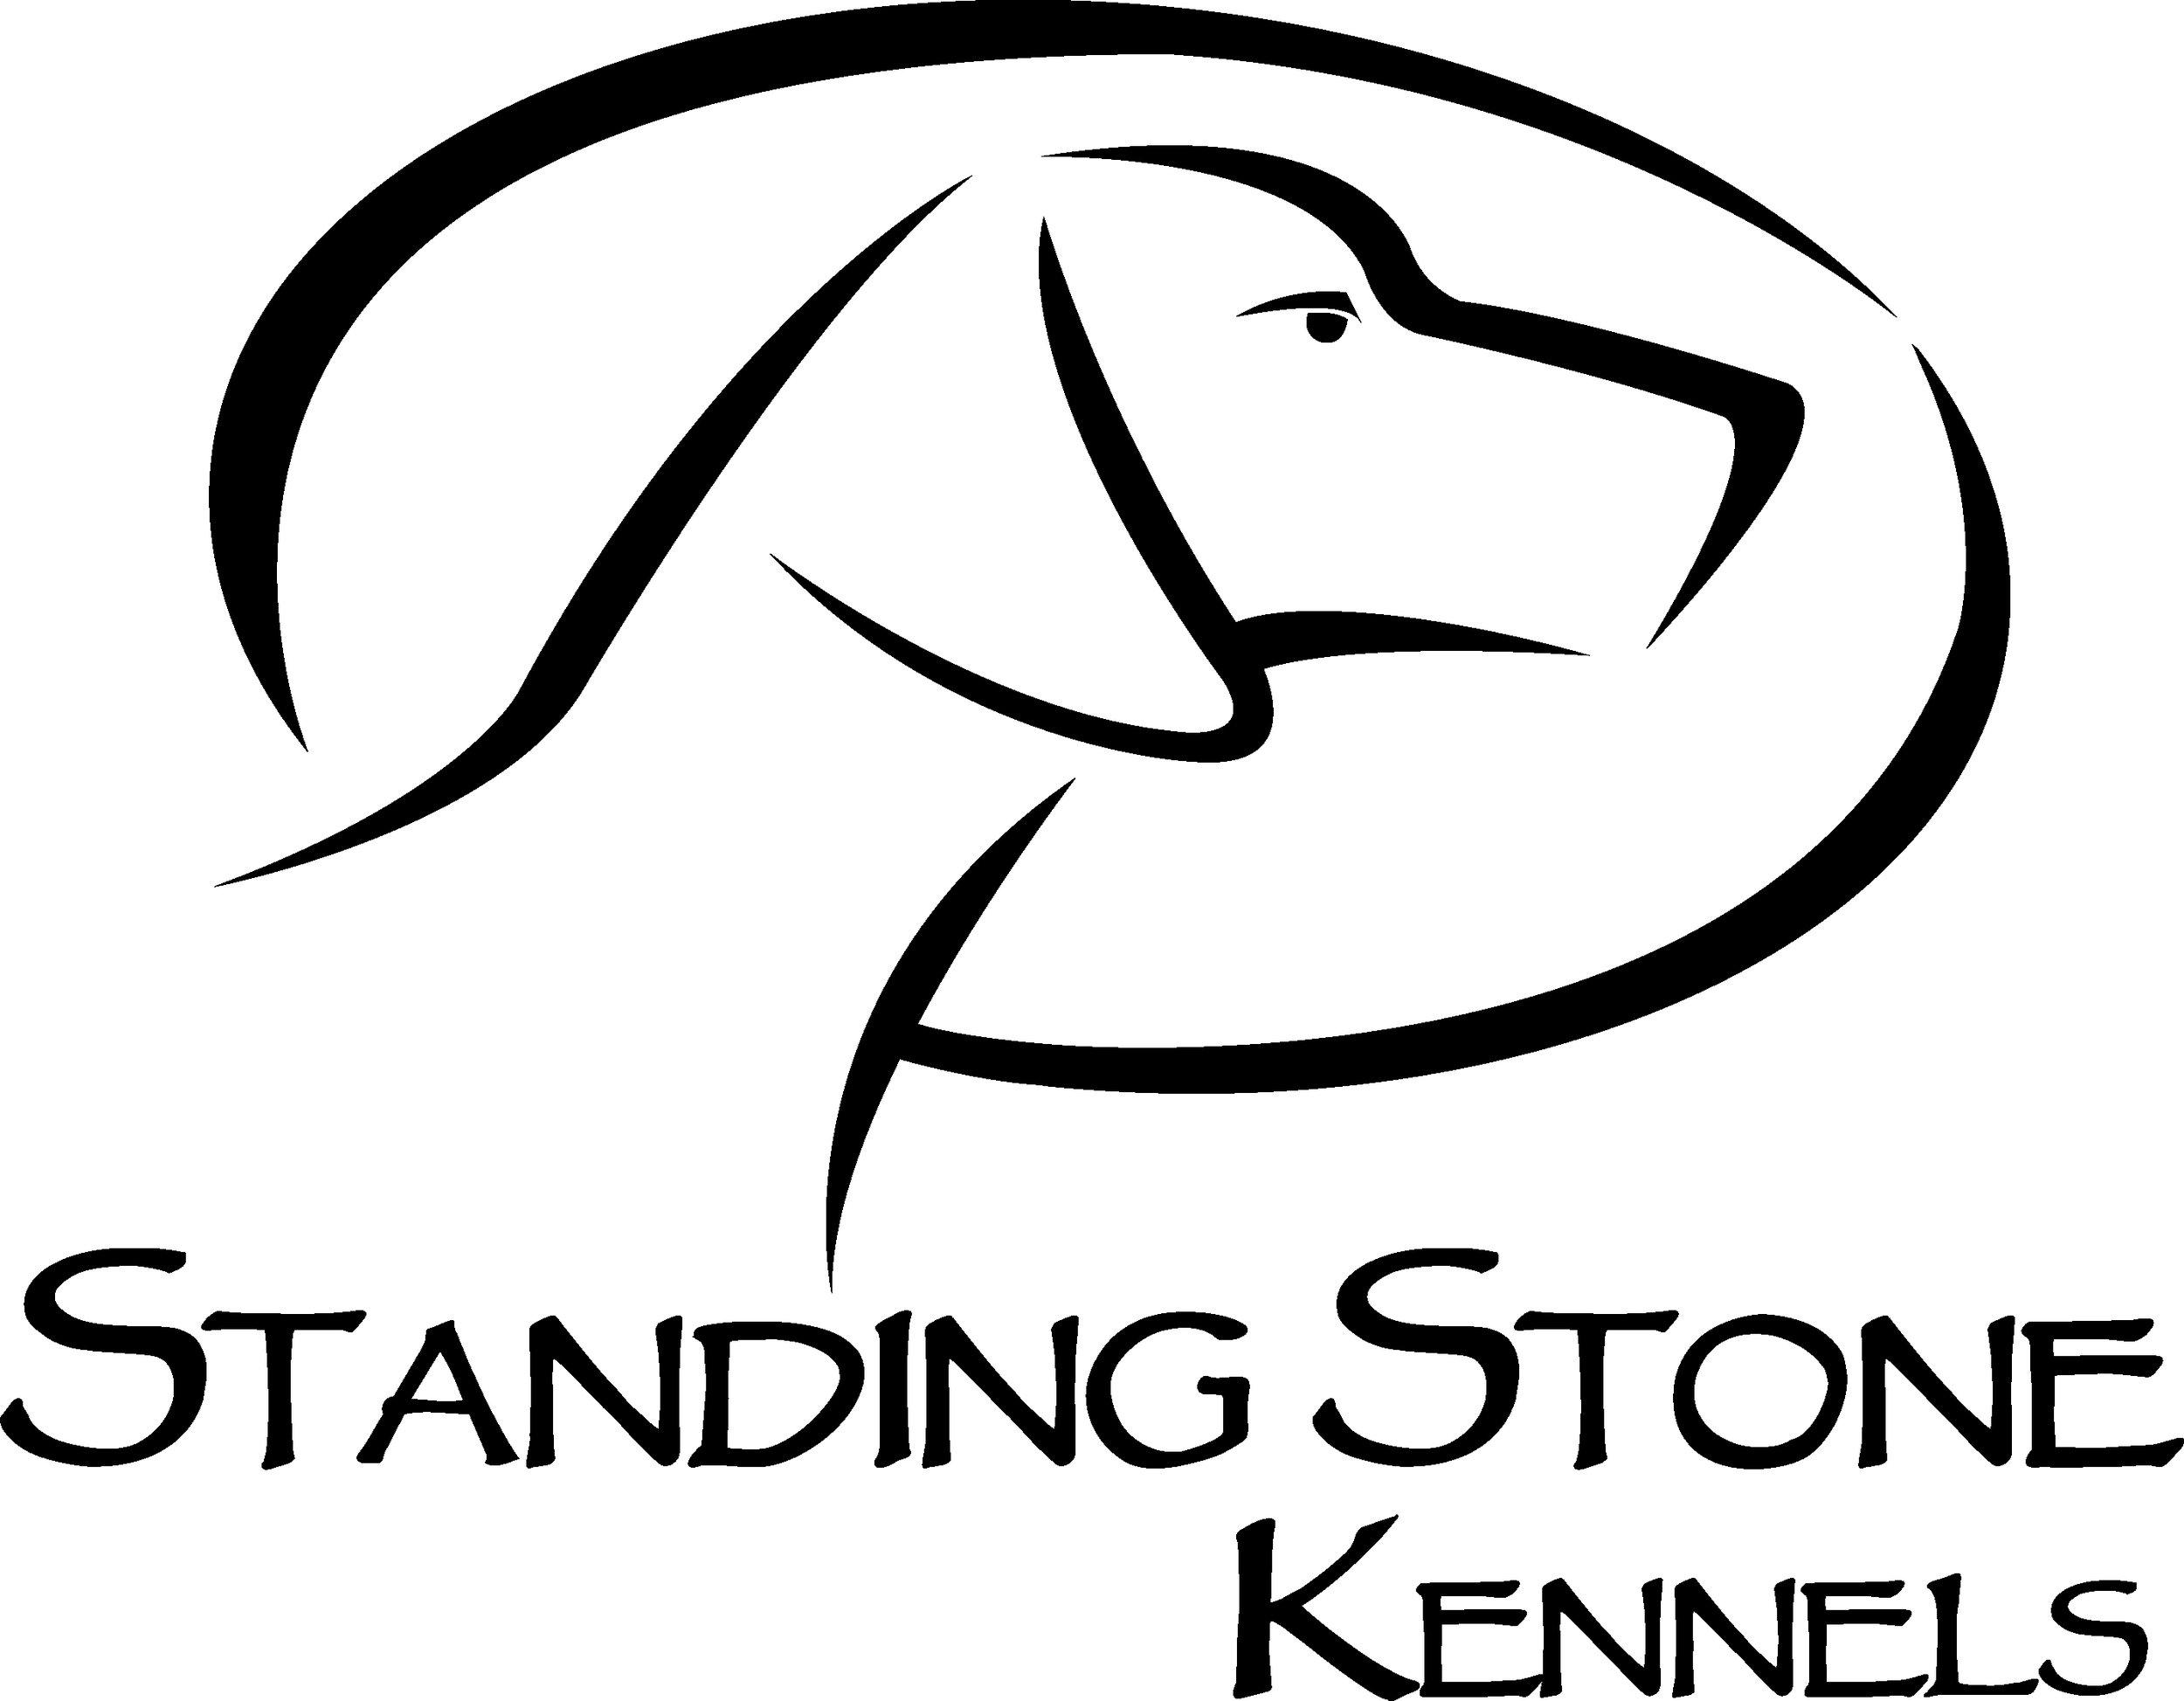 Standing Stone Kennels final logo.jpg